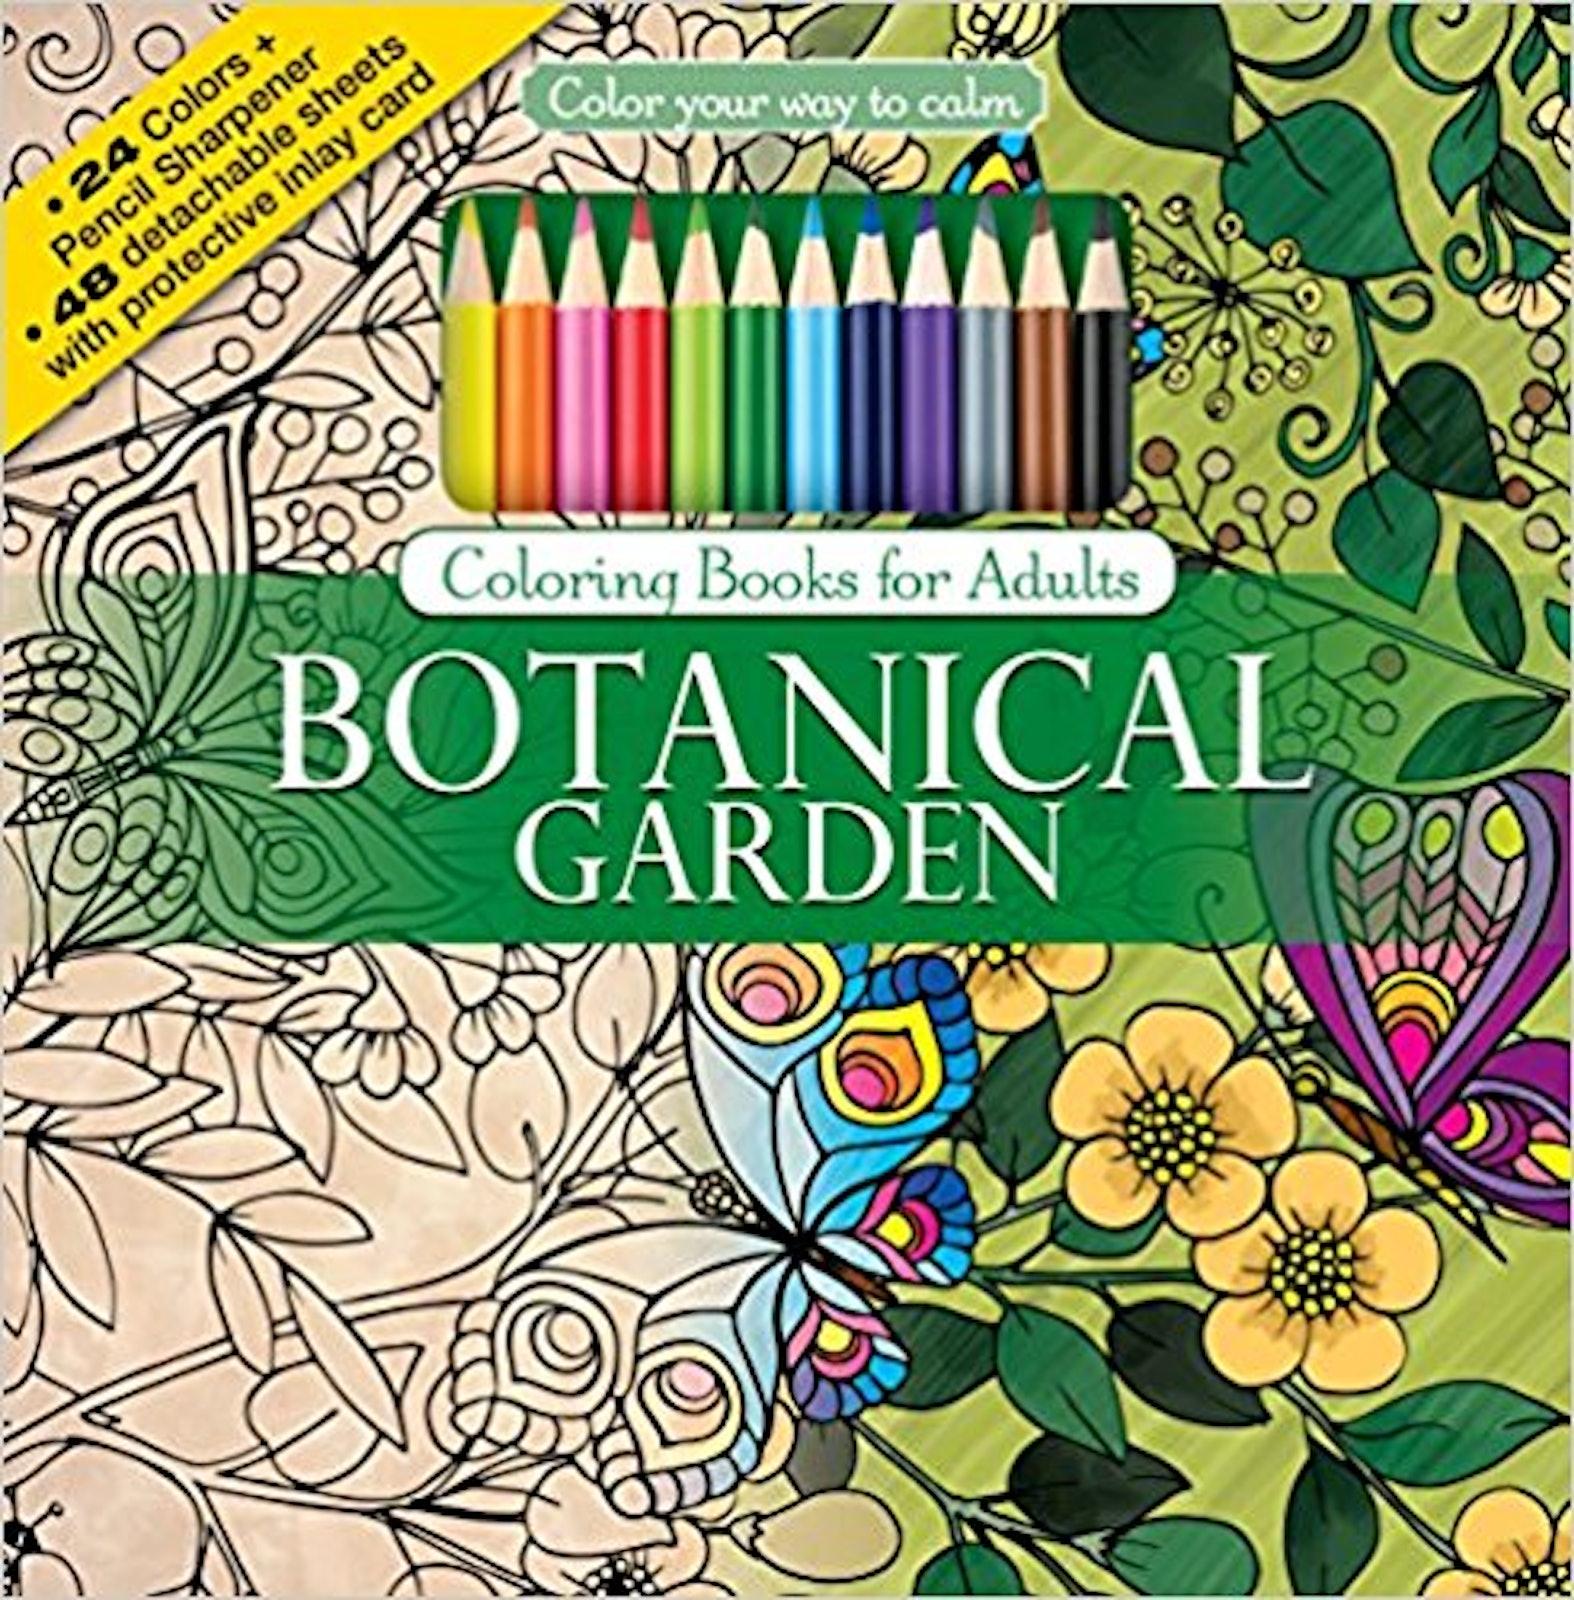 gardencolouringbook